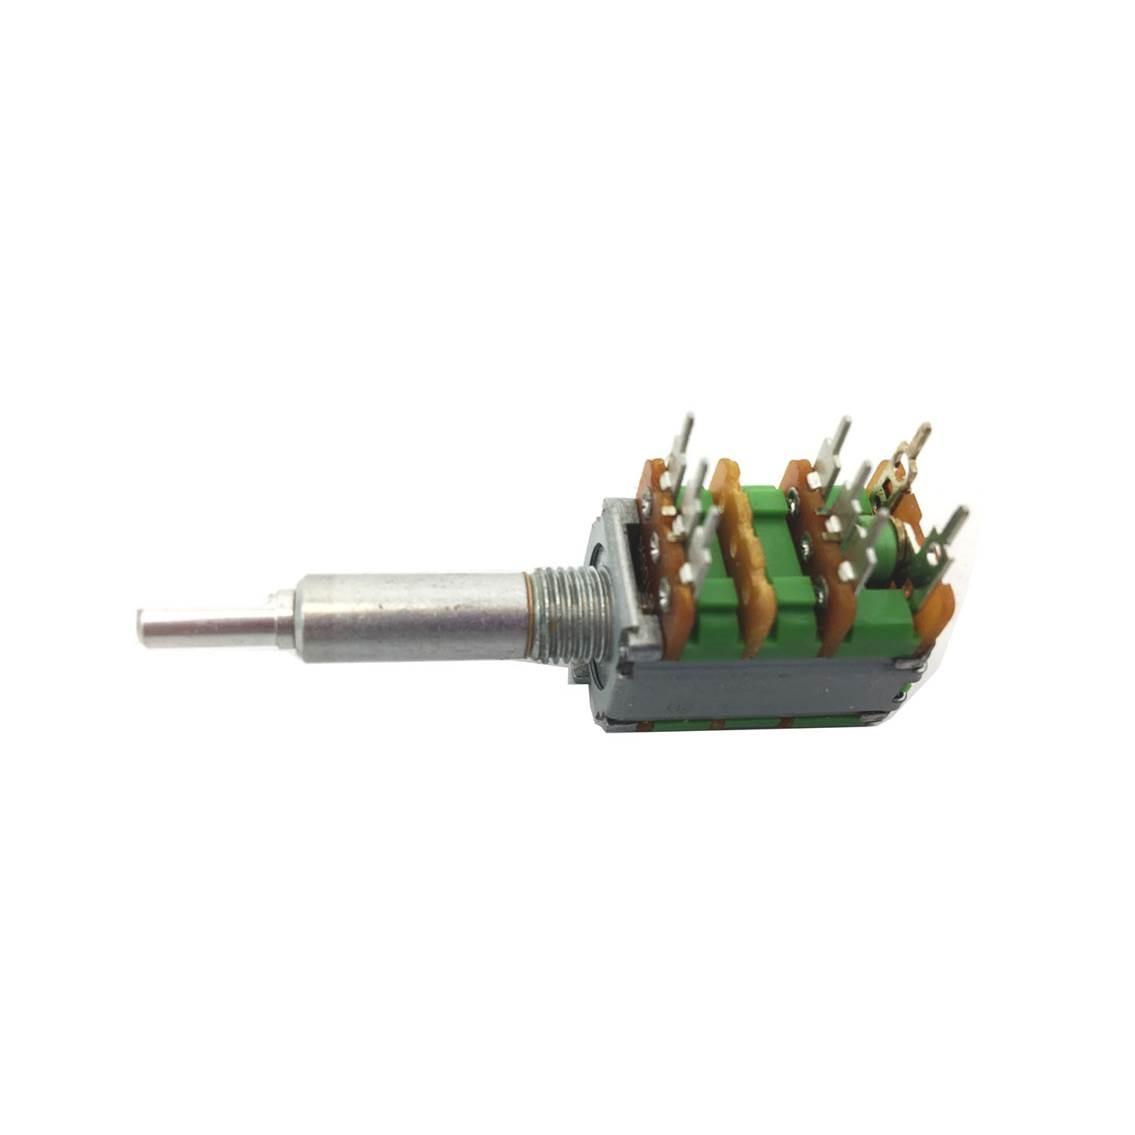 0083499003 - Cobra® C148GTL ON/OFF/VOL Switch (PIN STYLE)